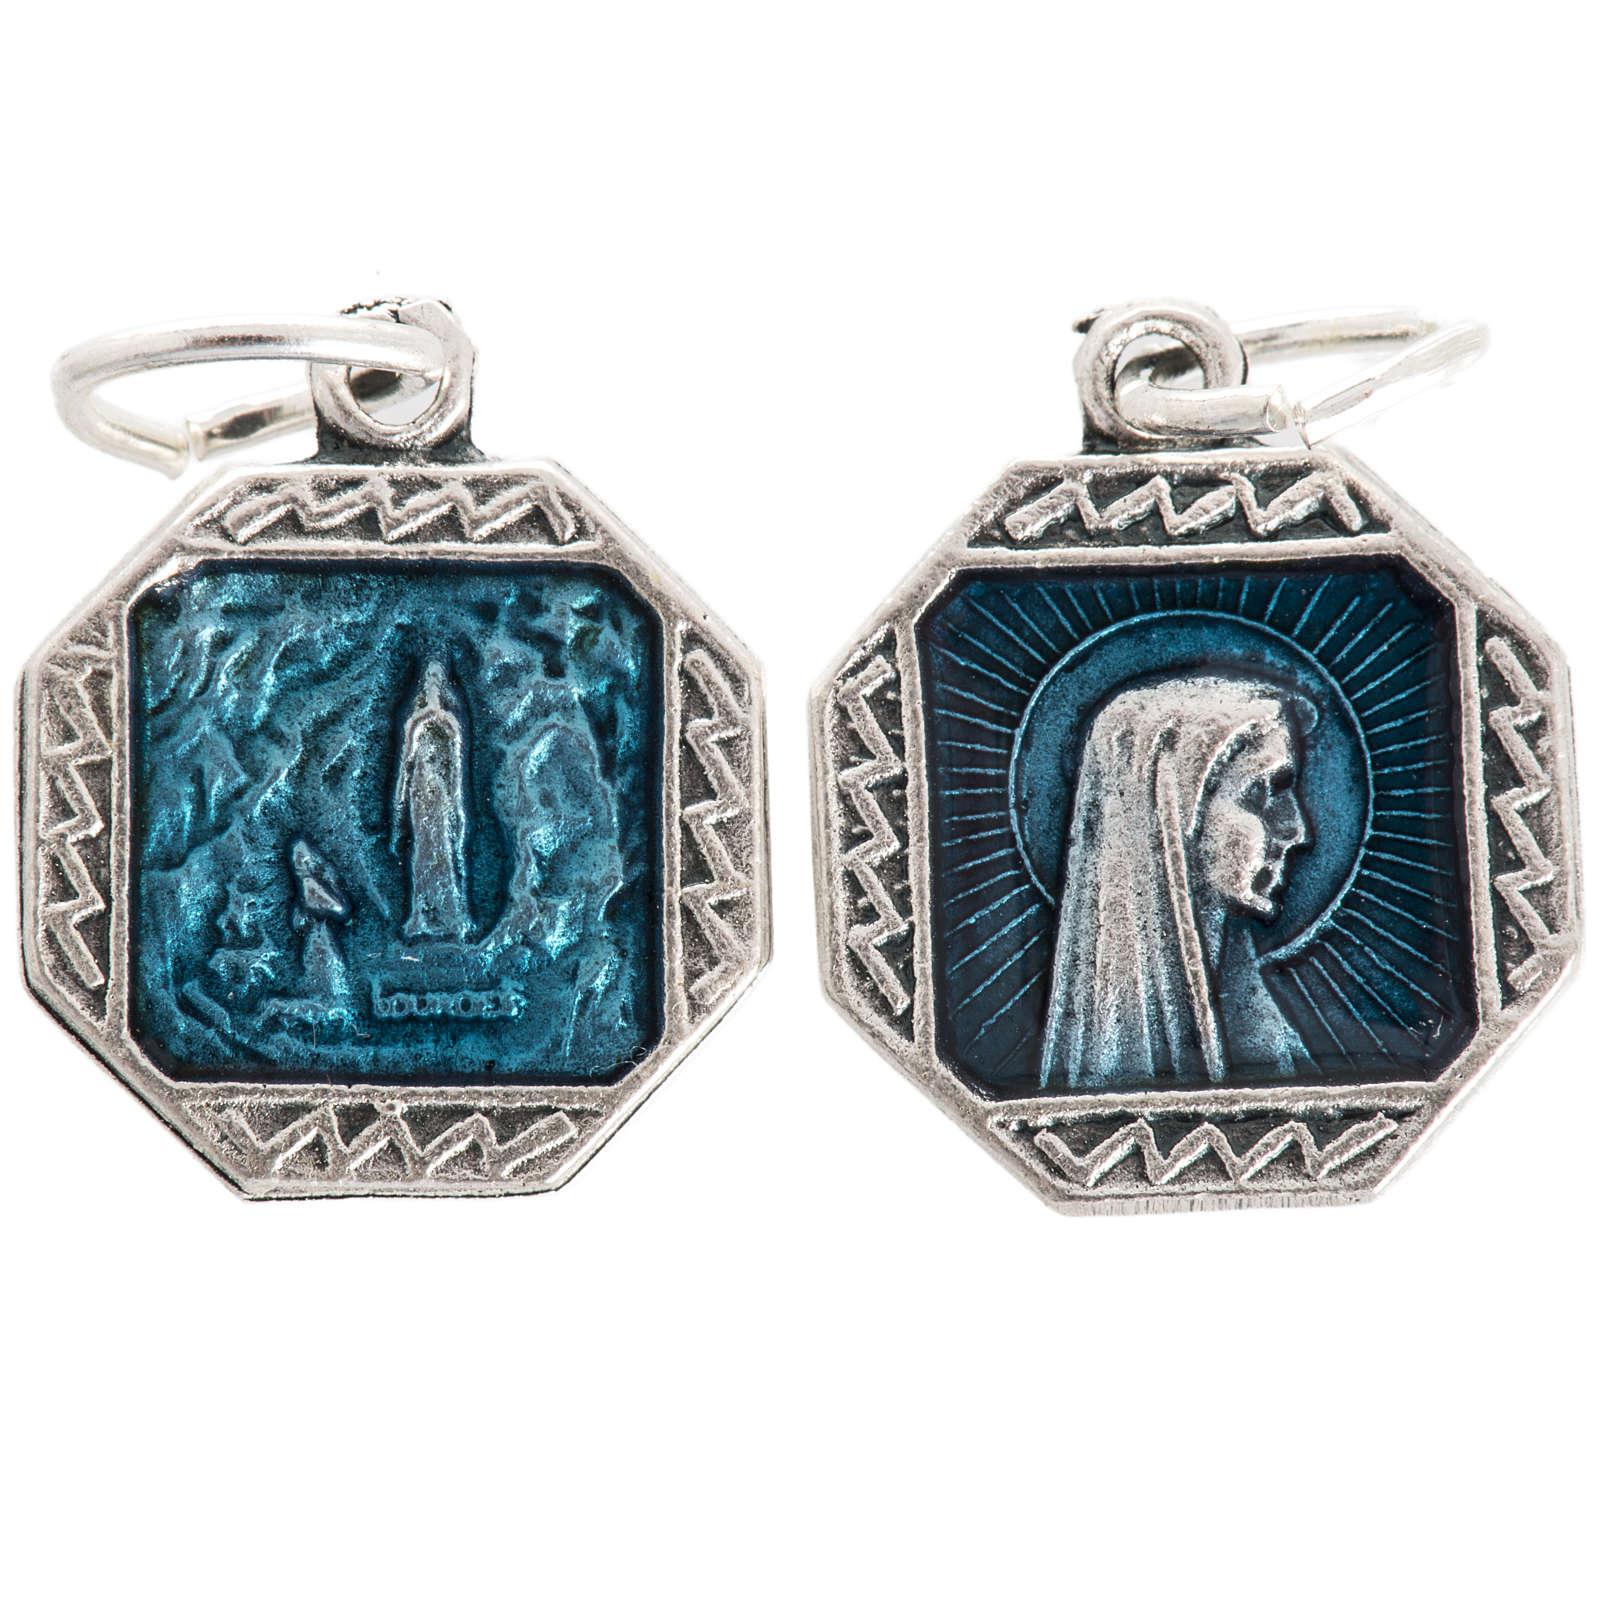 Our Lady of Lourdes medal in light blue enamel 12mm 4